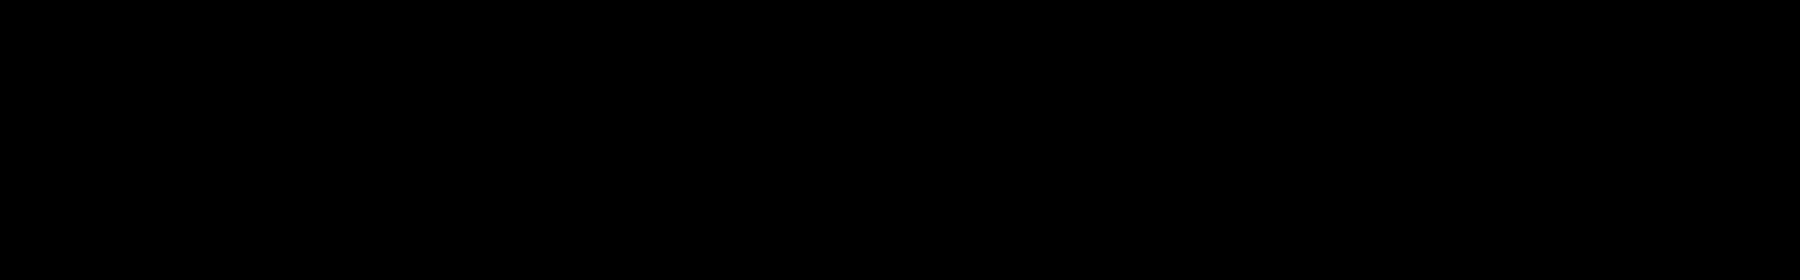 EDM Moombahton audio waveform